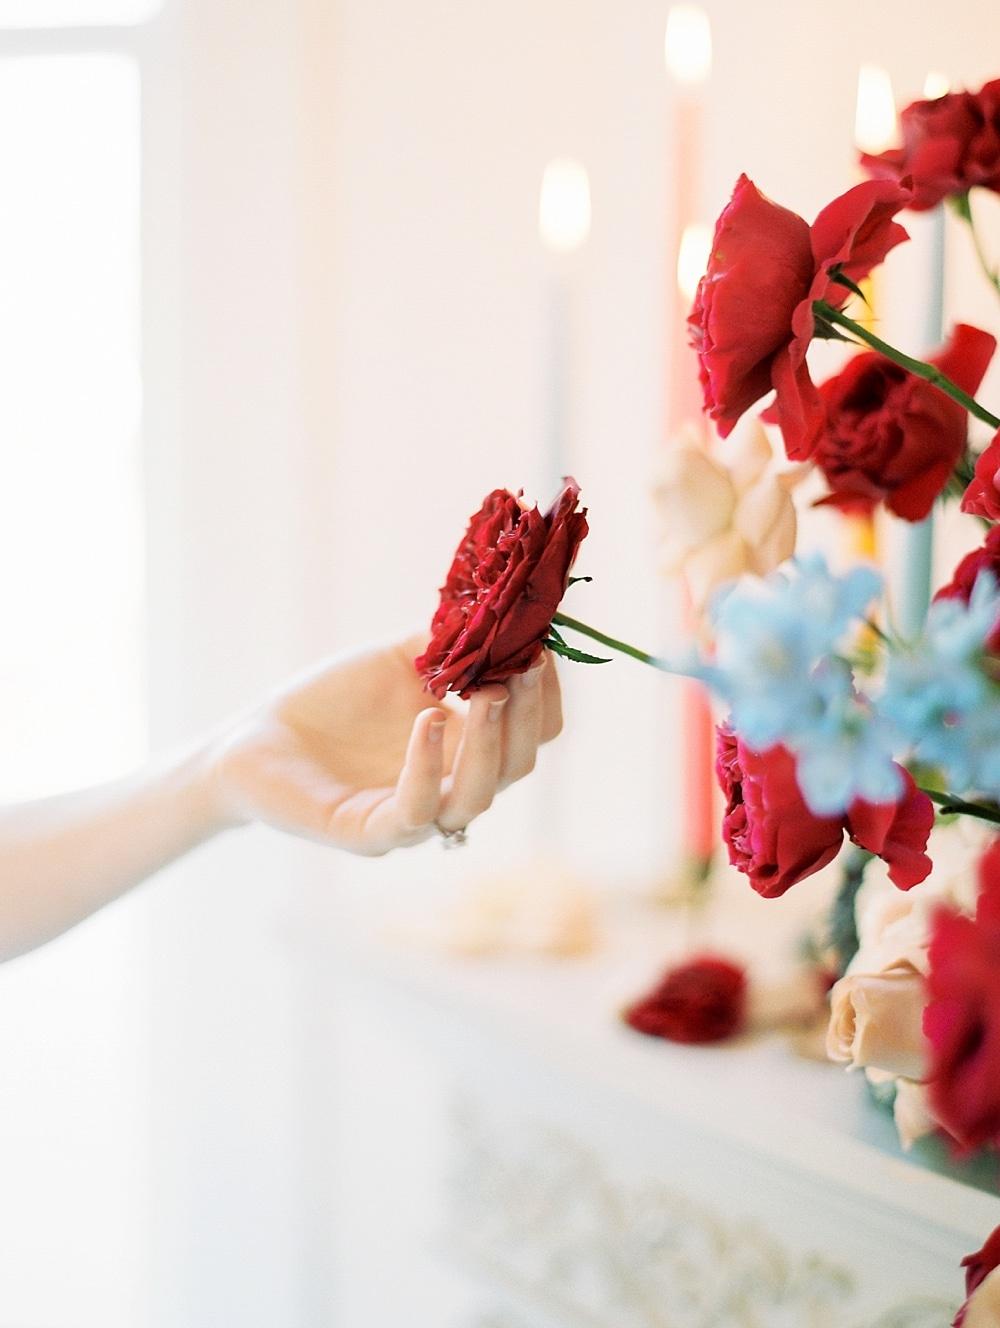 kristin-la-voie-photography-austin-wedding-photographer-woodbine-mansion-2